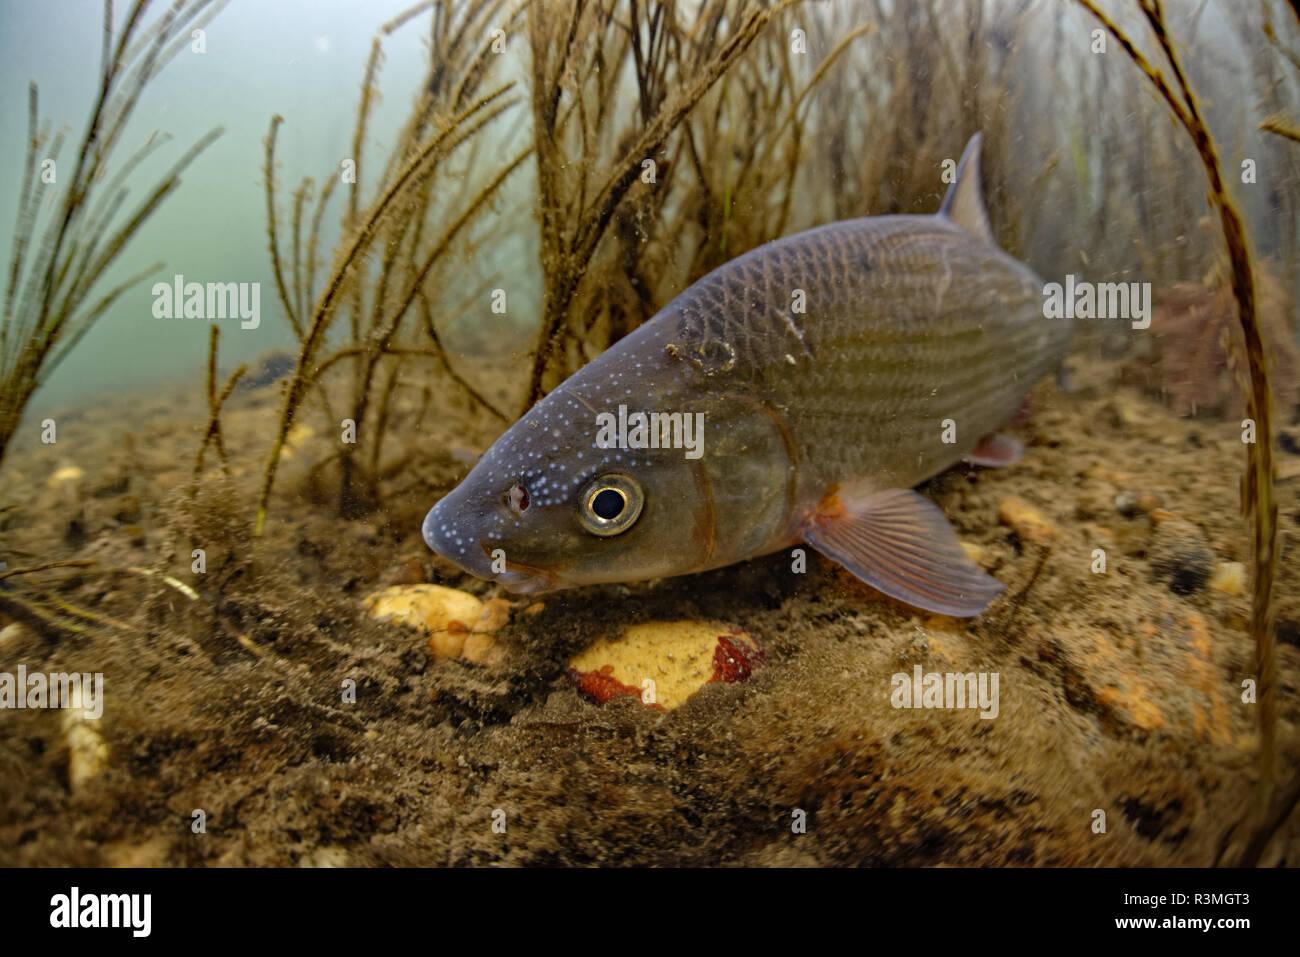 Common Nase (Chondrostoma nasus), Le Cher River, Loir-et-Cher, France Stock Photo